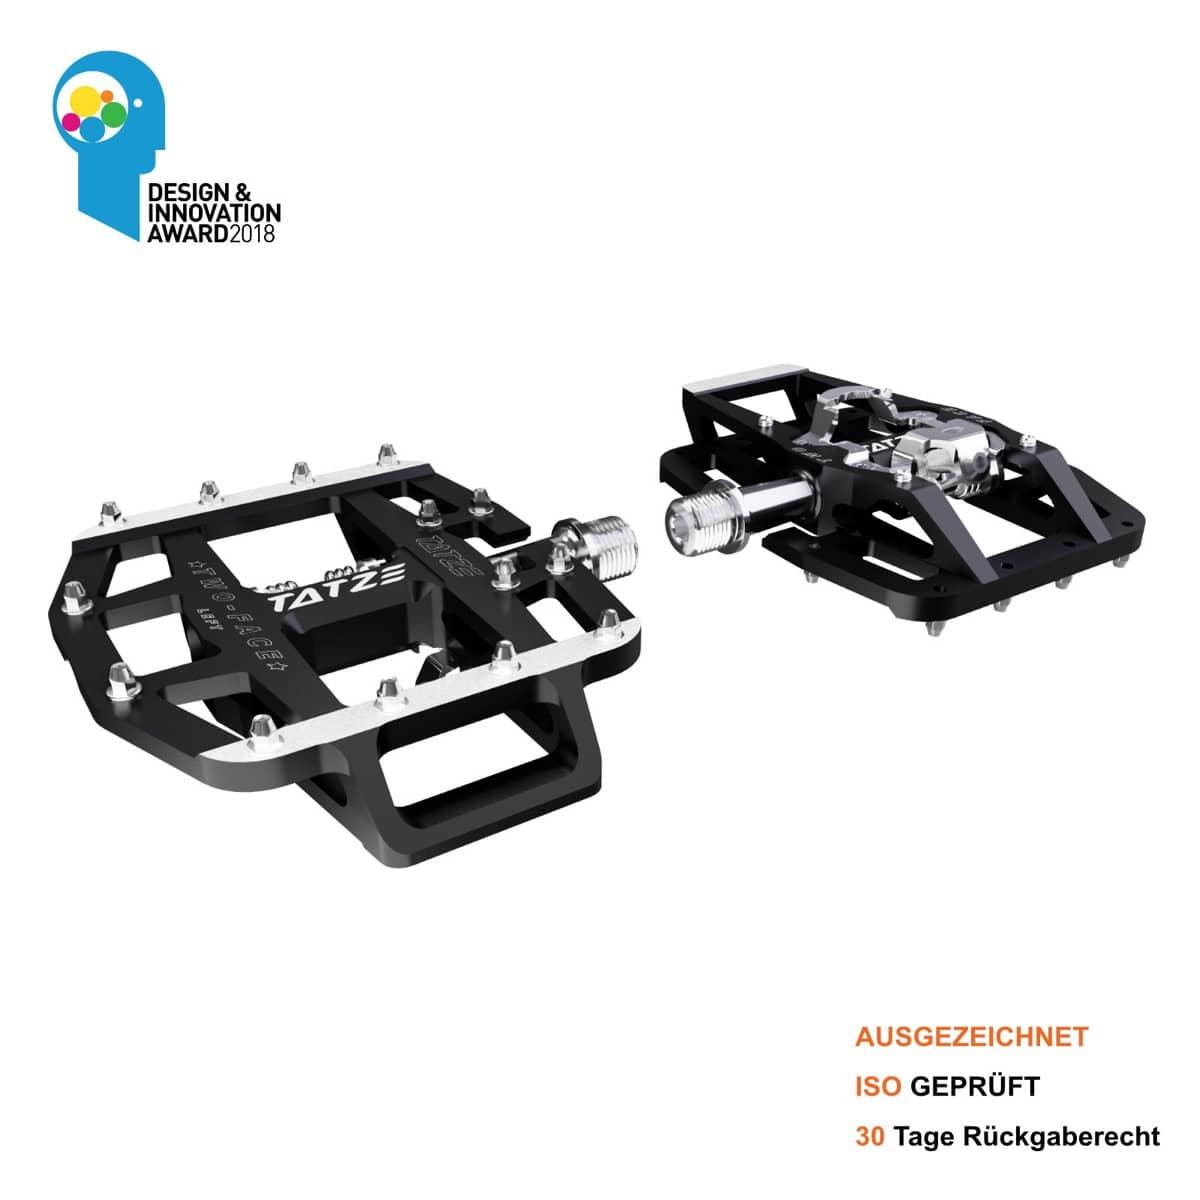 Tatze bike-components TWO-FACE